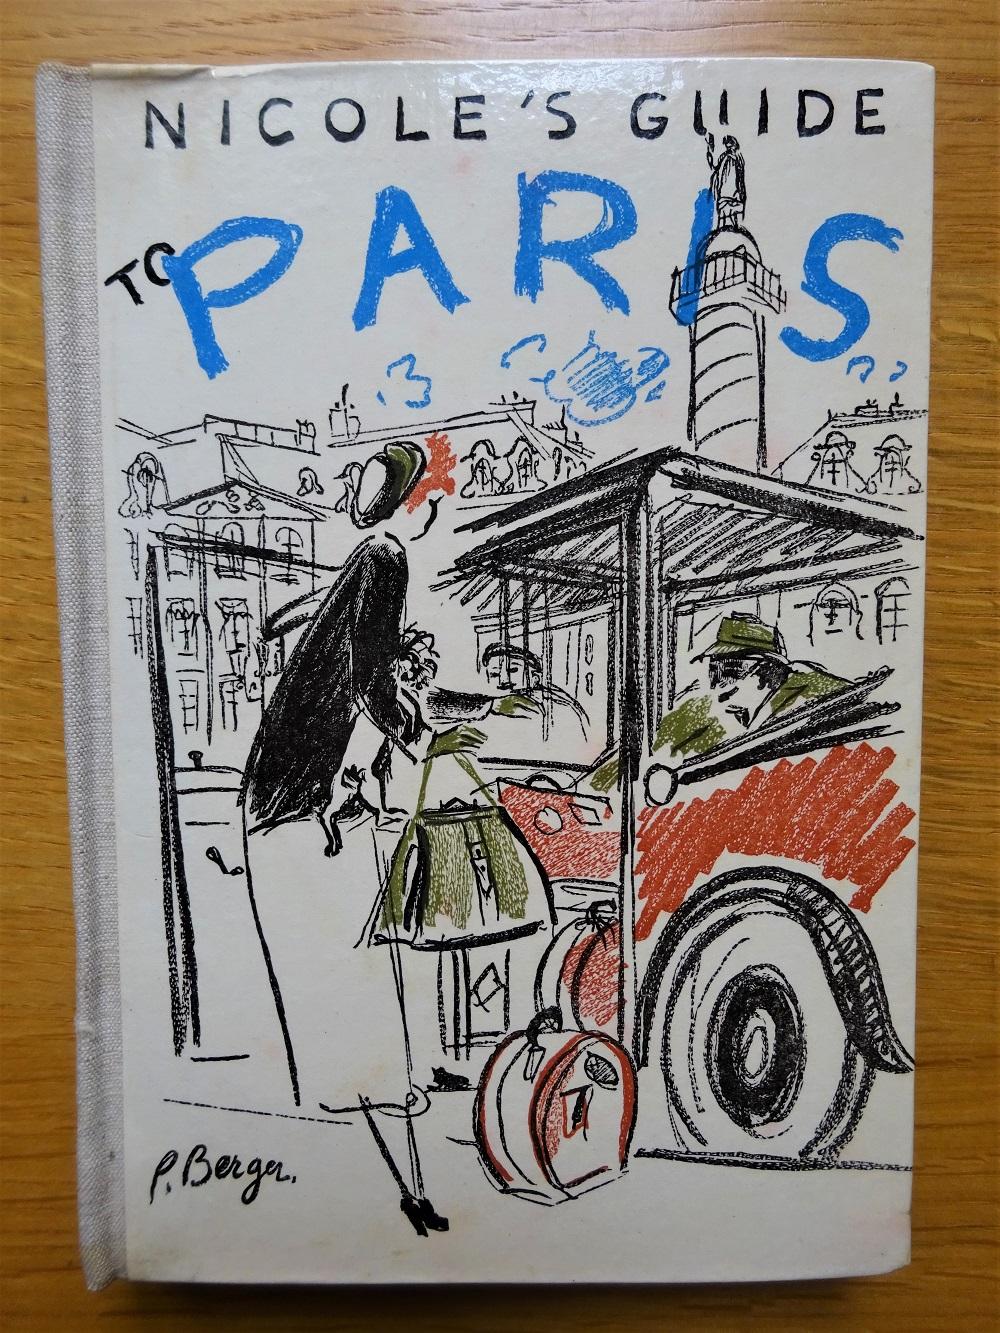 Nicole's guide to Paris